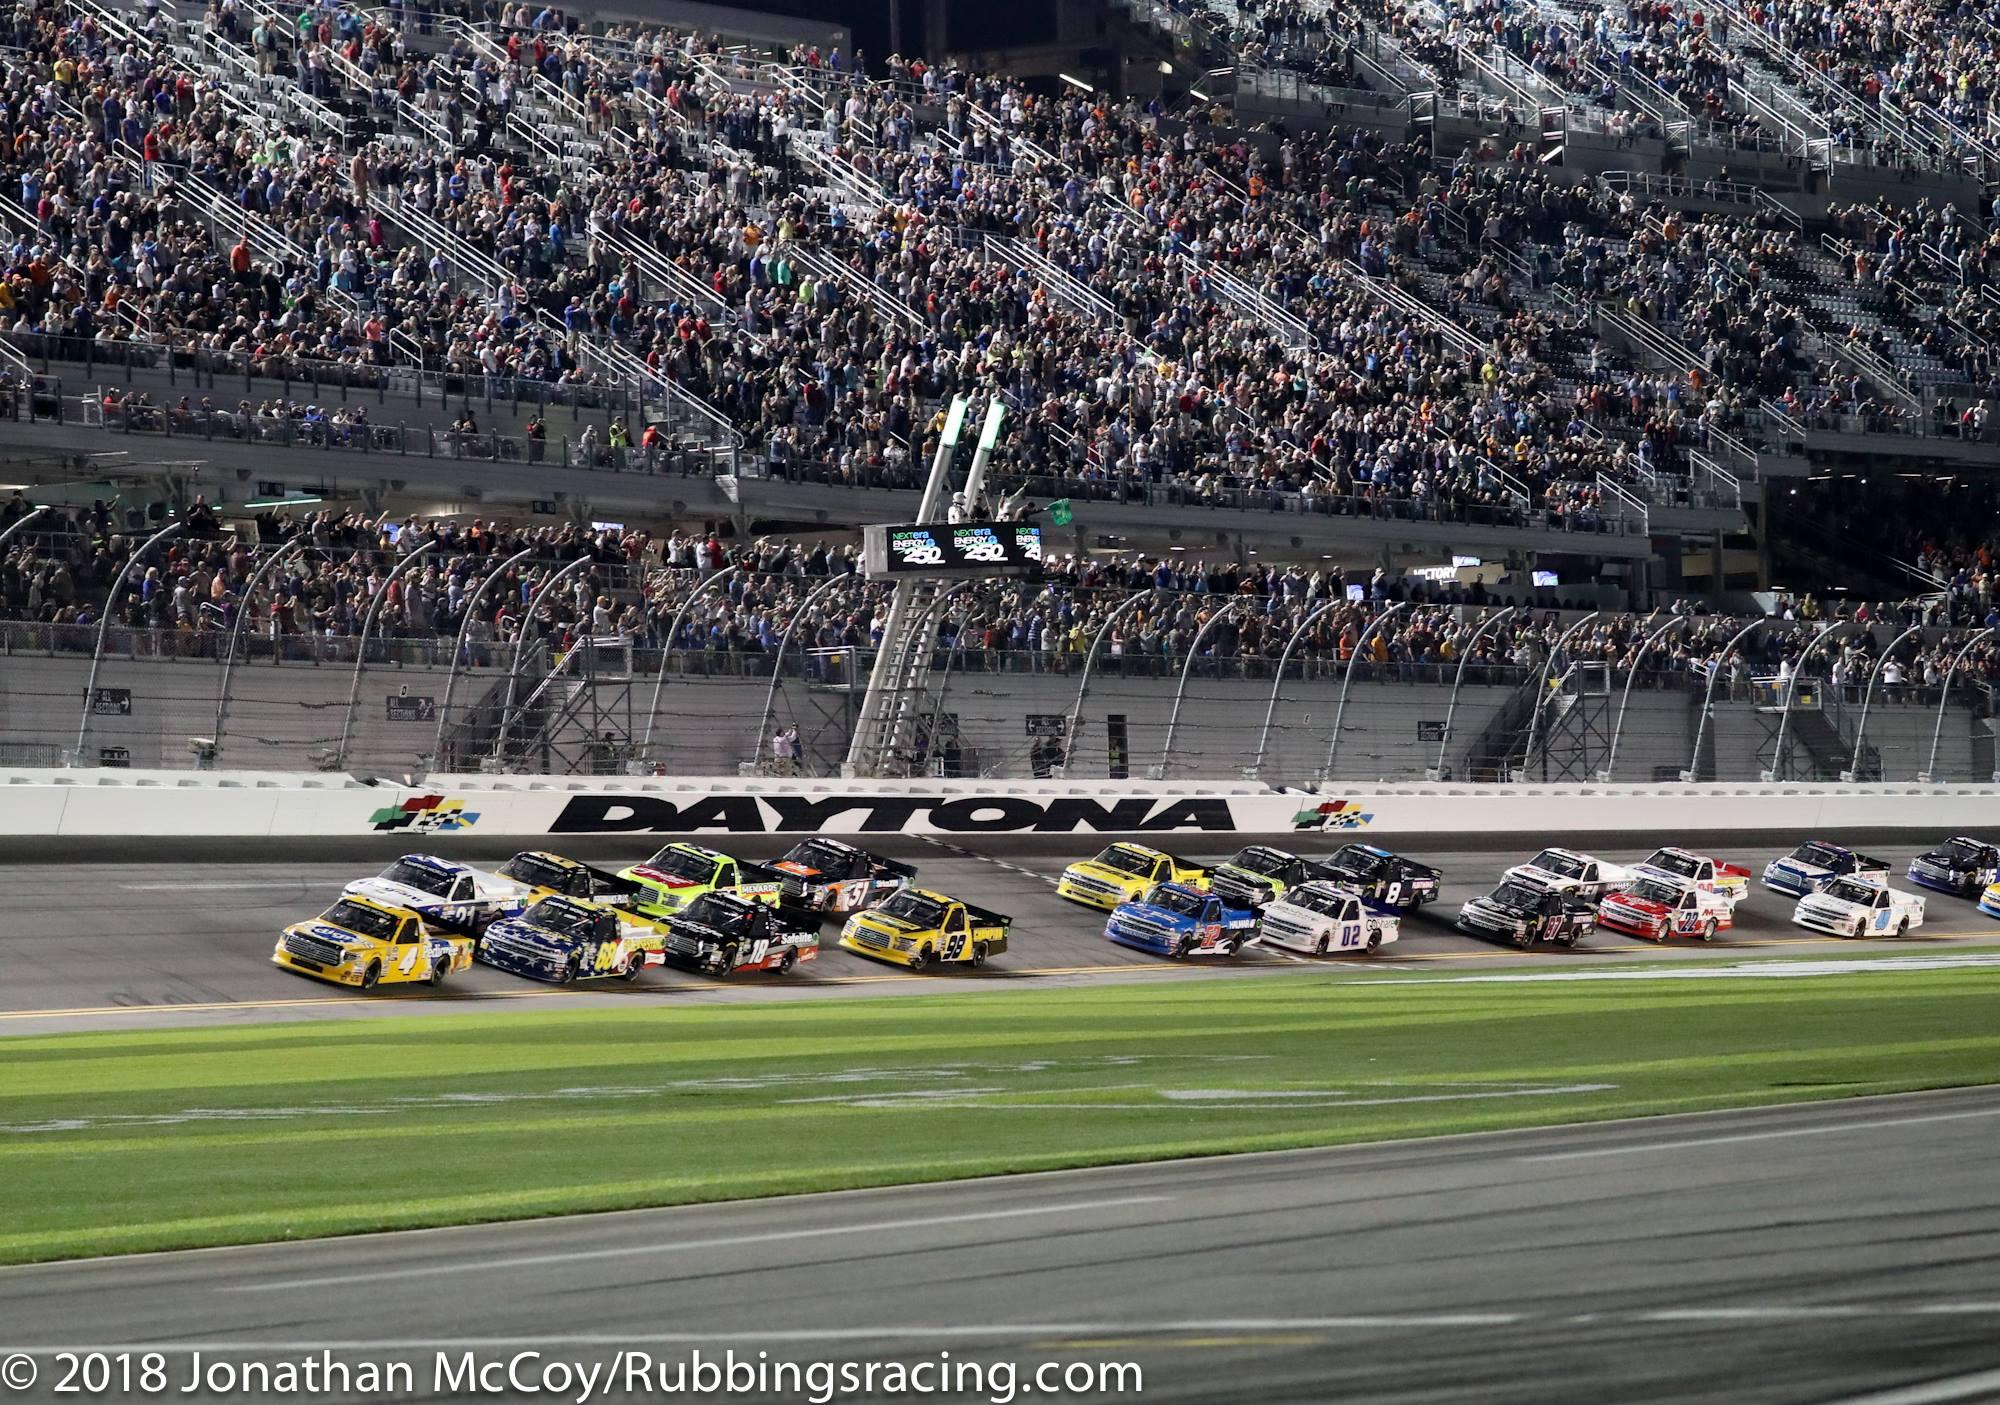 NCWTS: Sauter wins for third time at Daytona